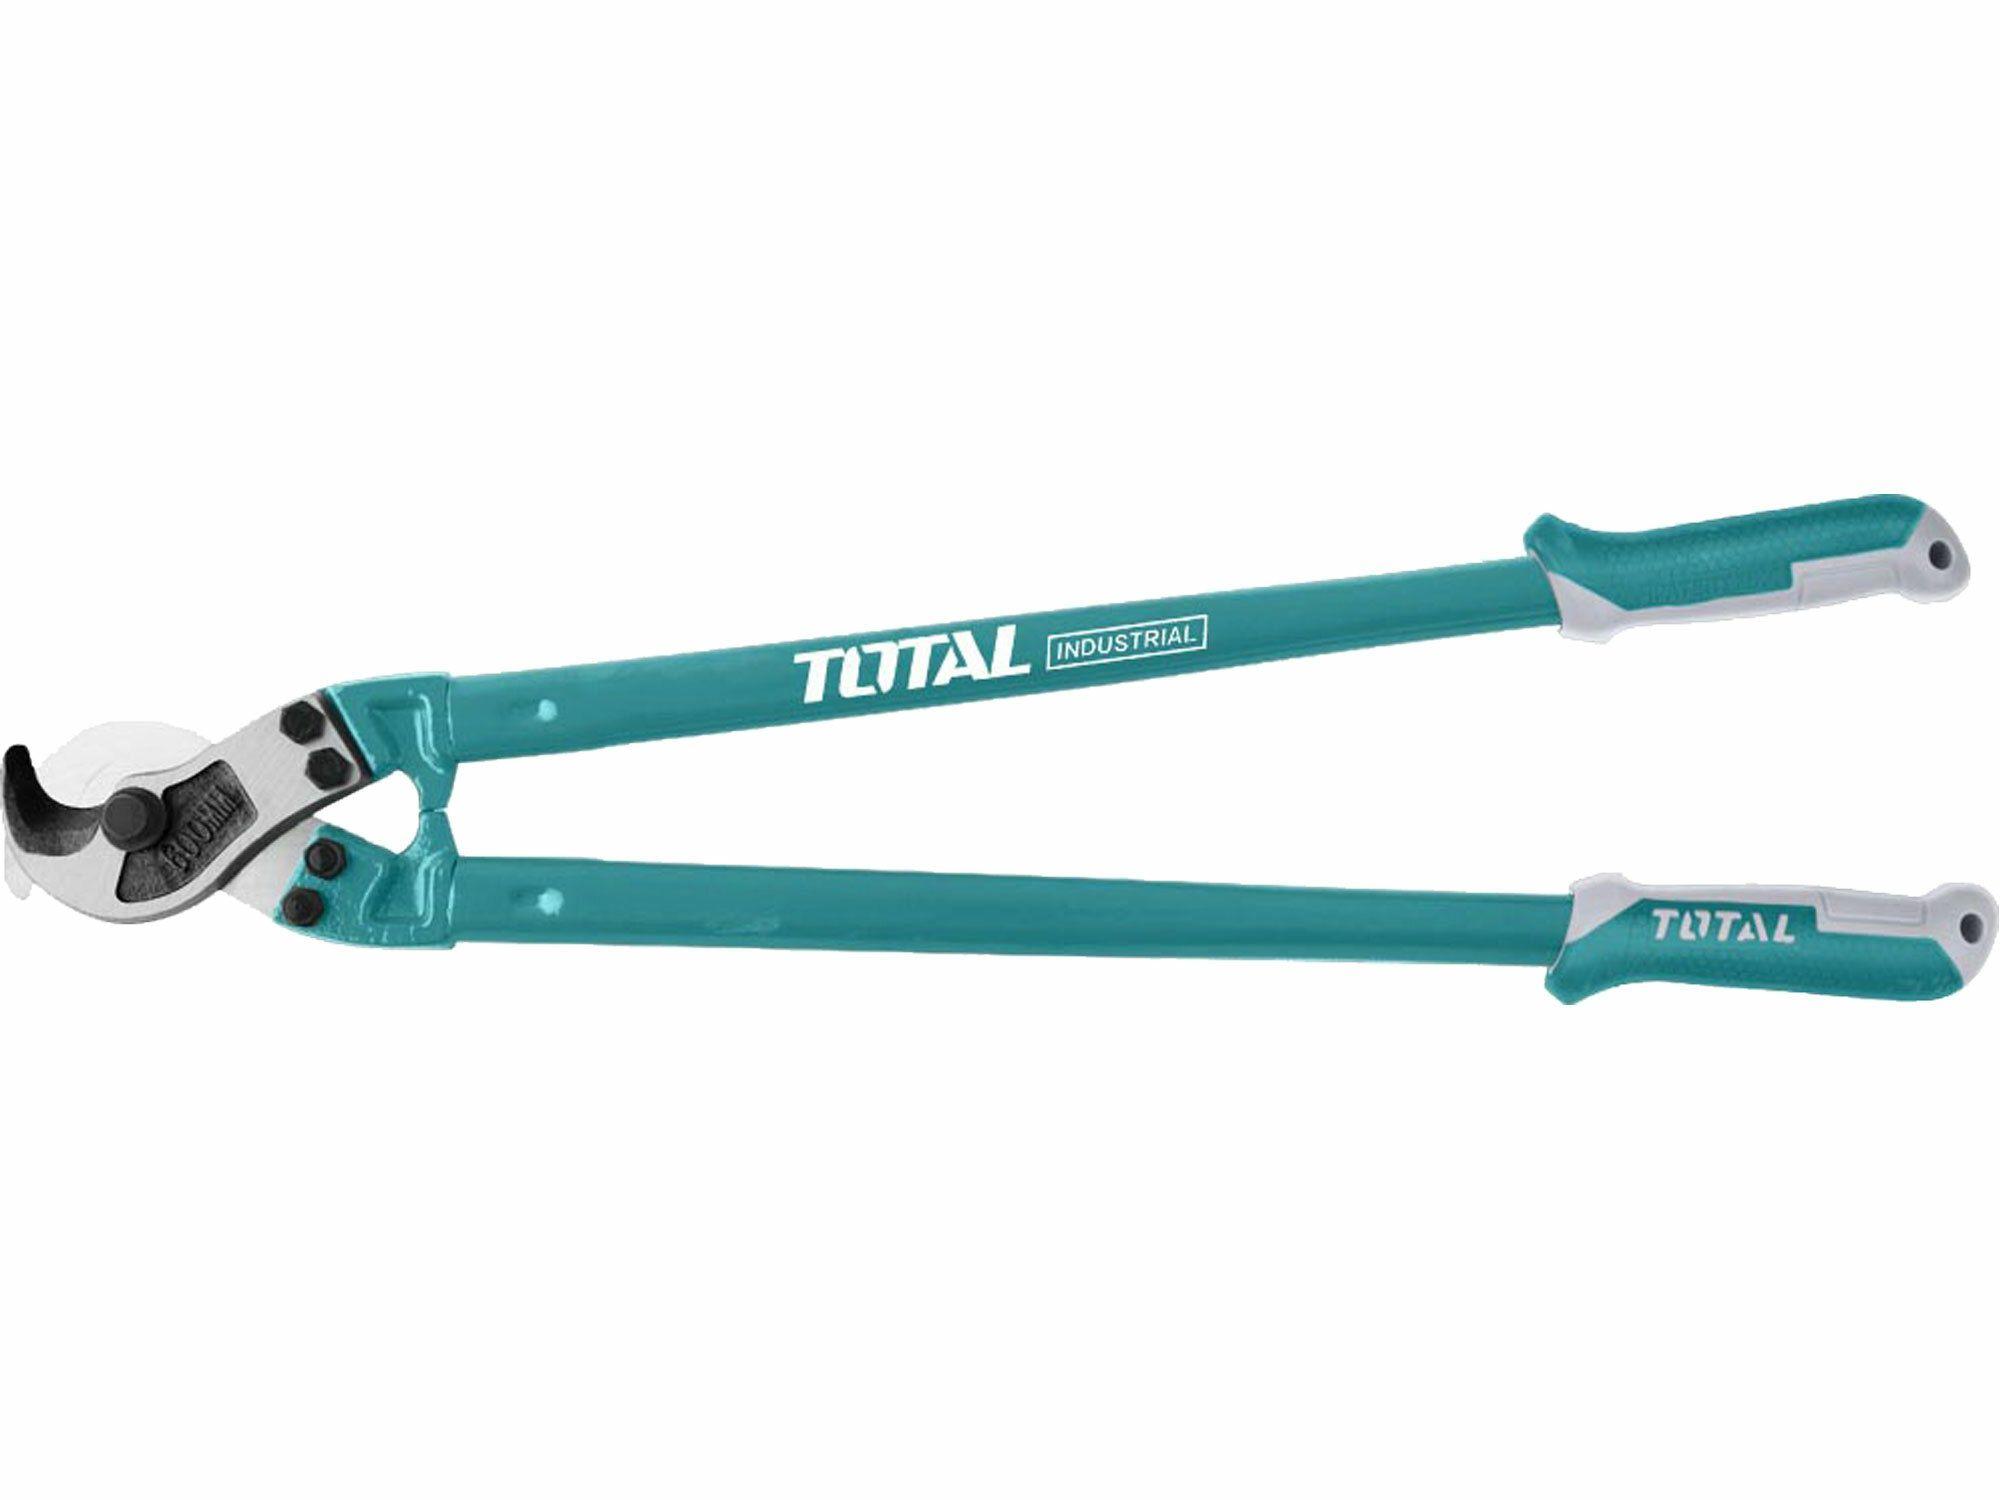 TOTAL THT115242 Kleště na kabely, 600mm, industrial